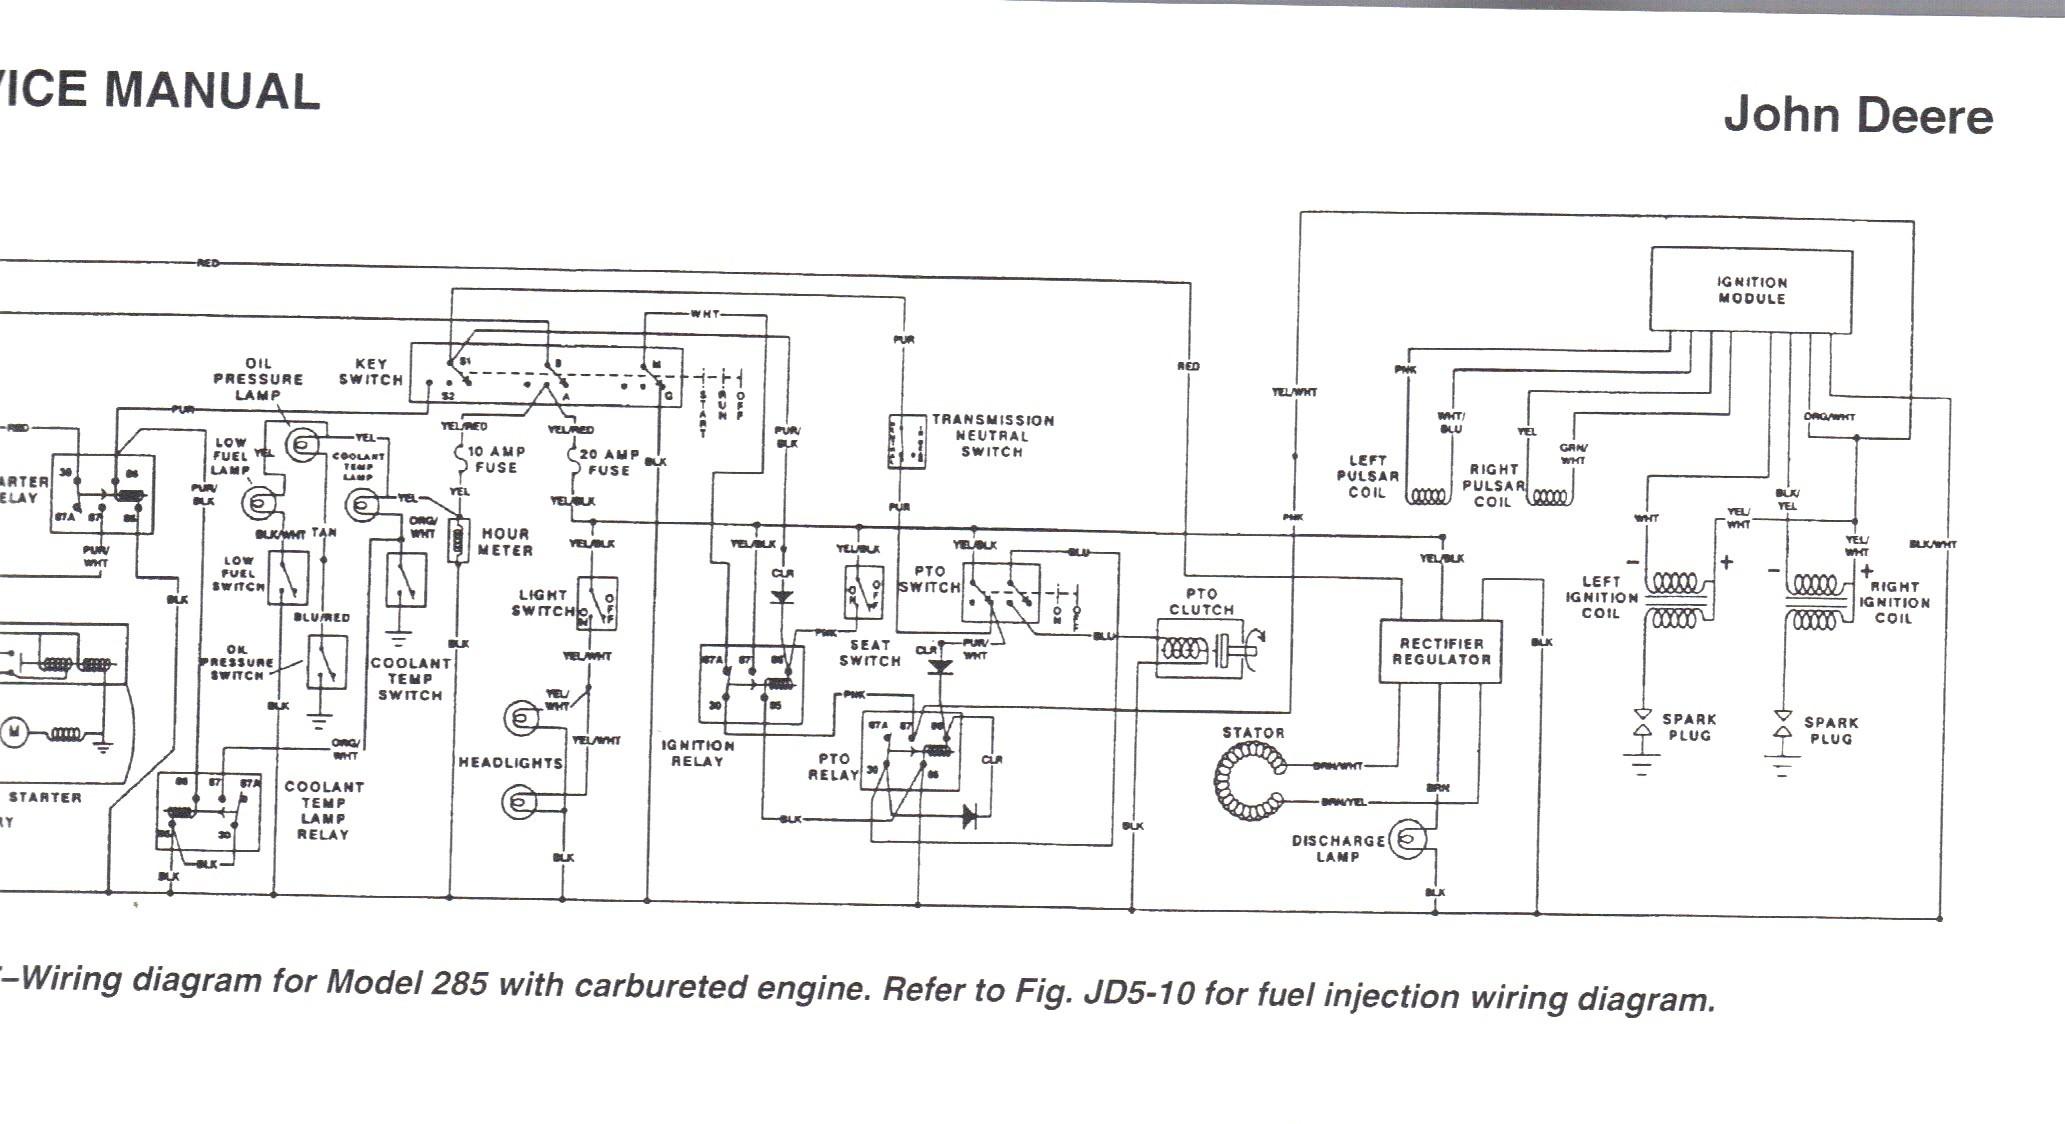 John Deere 170 Lawn Tractor Wiring Diagram